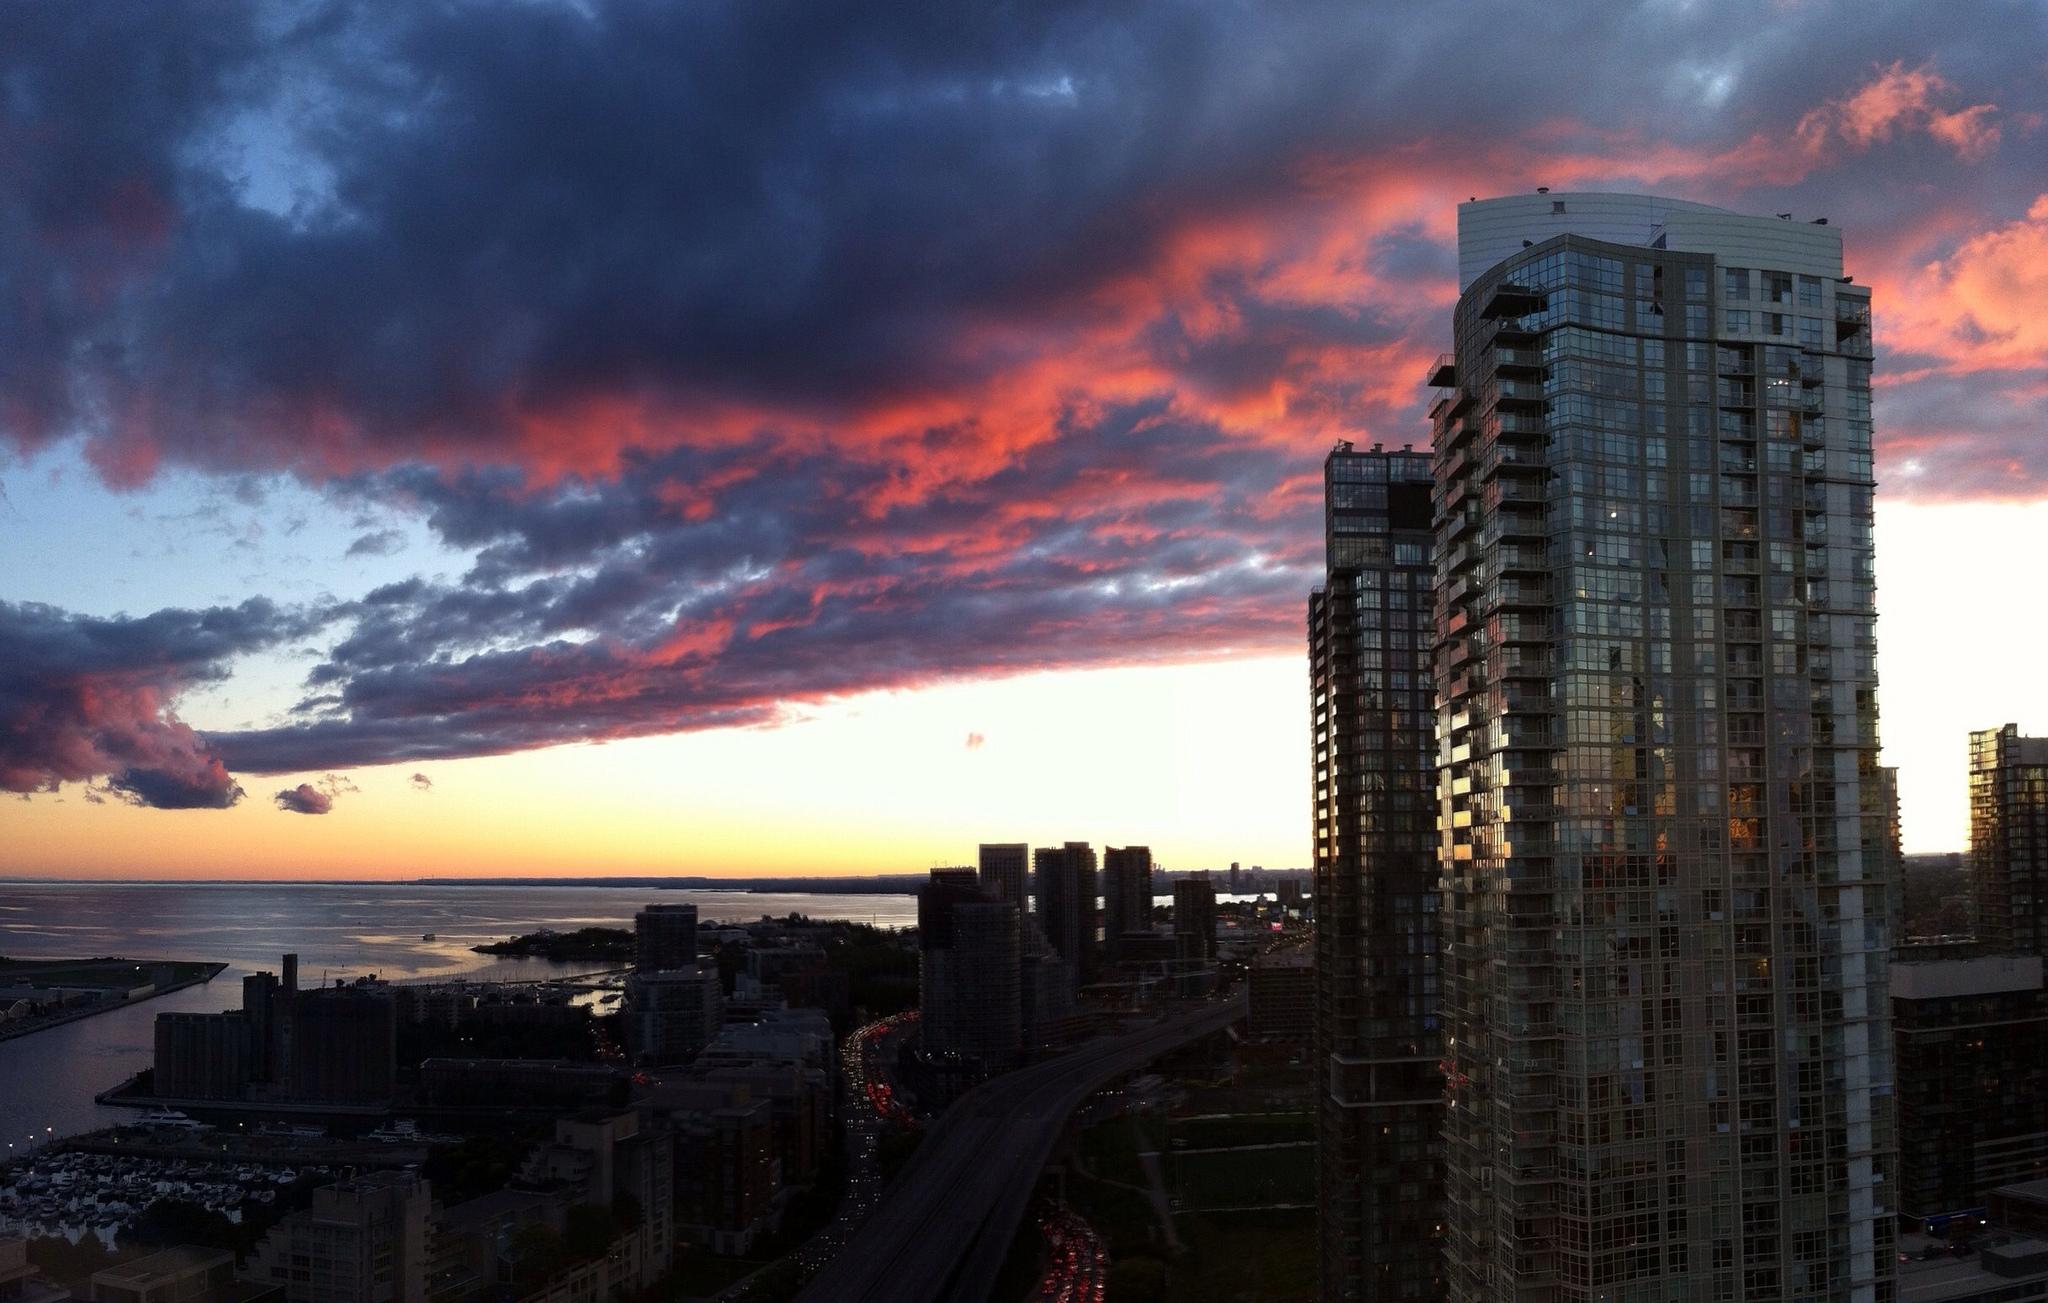 Sunset across condo towers in Toronto | © Andrew Rivett/ Flickr